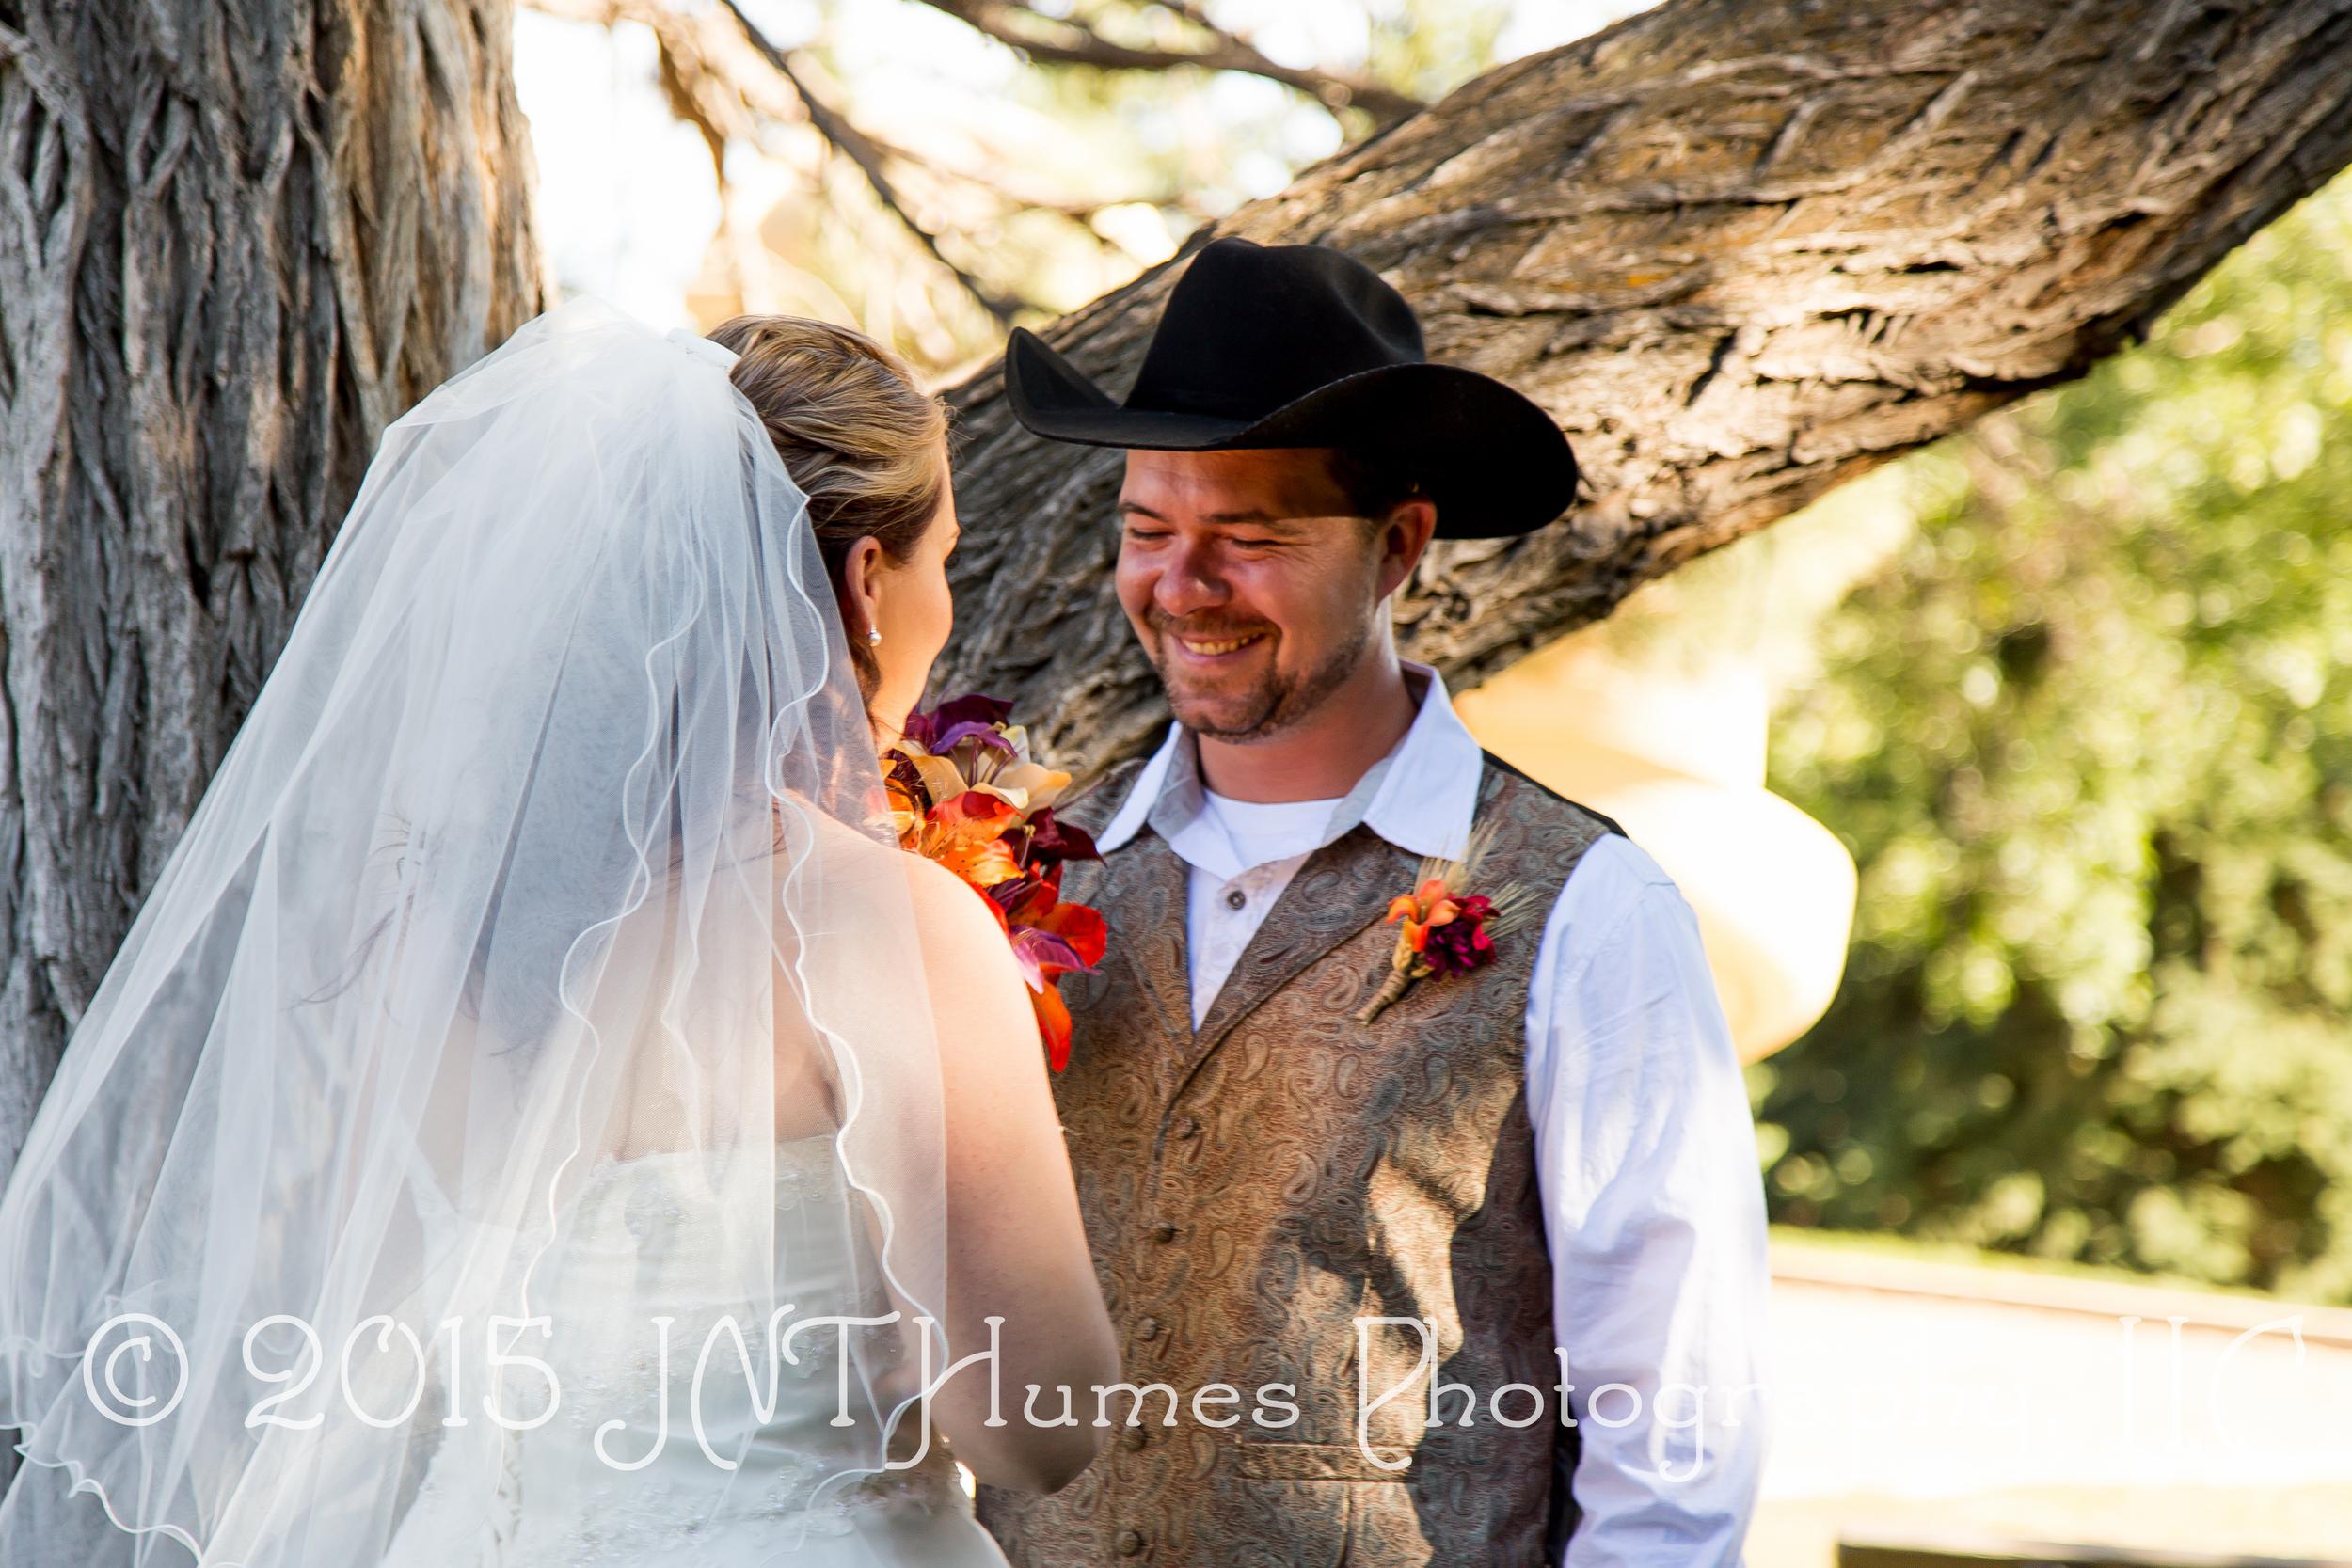 IMG_14632015-09-19© 2015 JNT Humes Photography, LLC.jpg